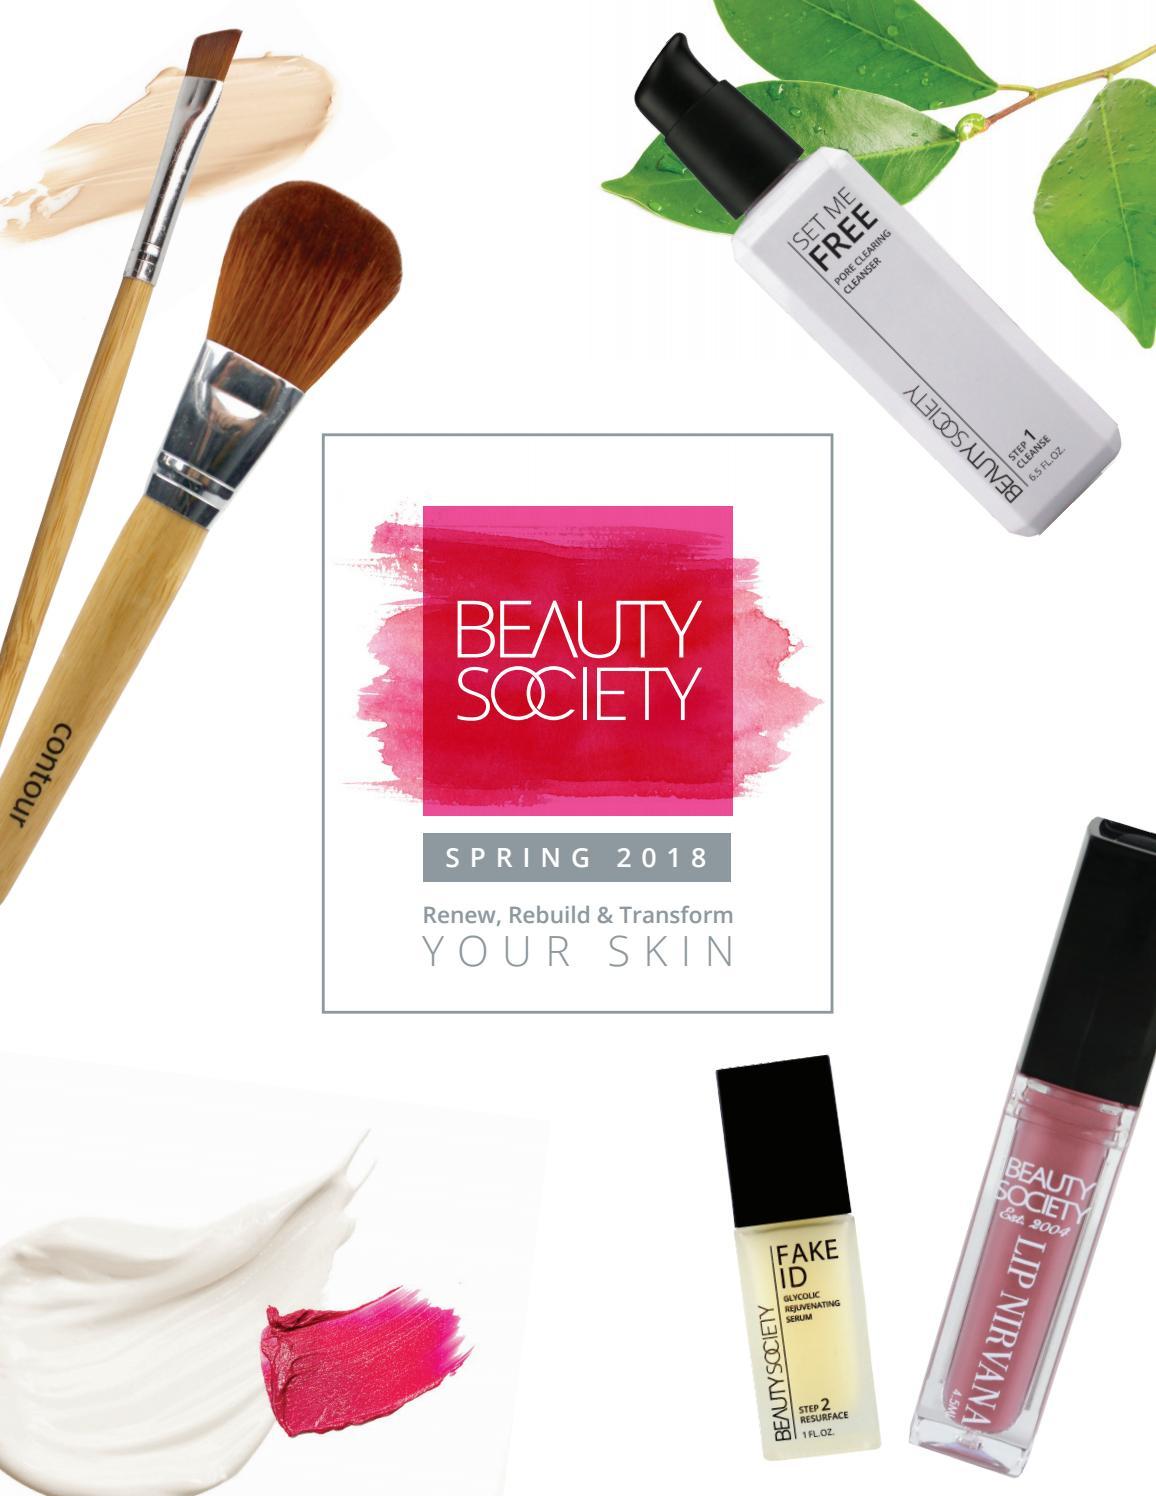 Beauty requires sacrifice Cosmetics that kill us